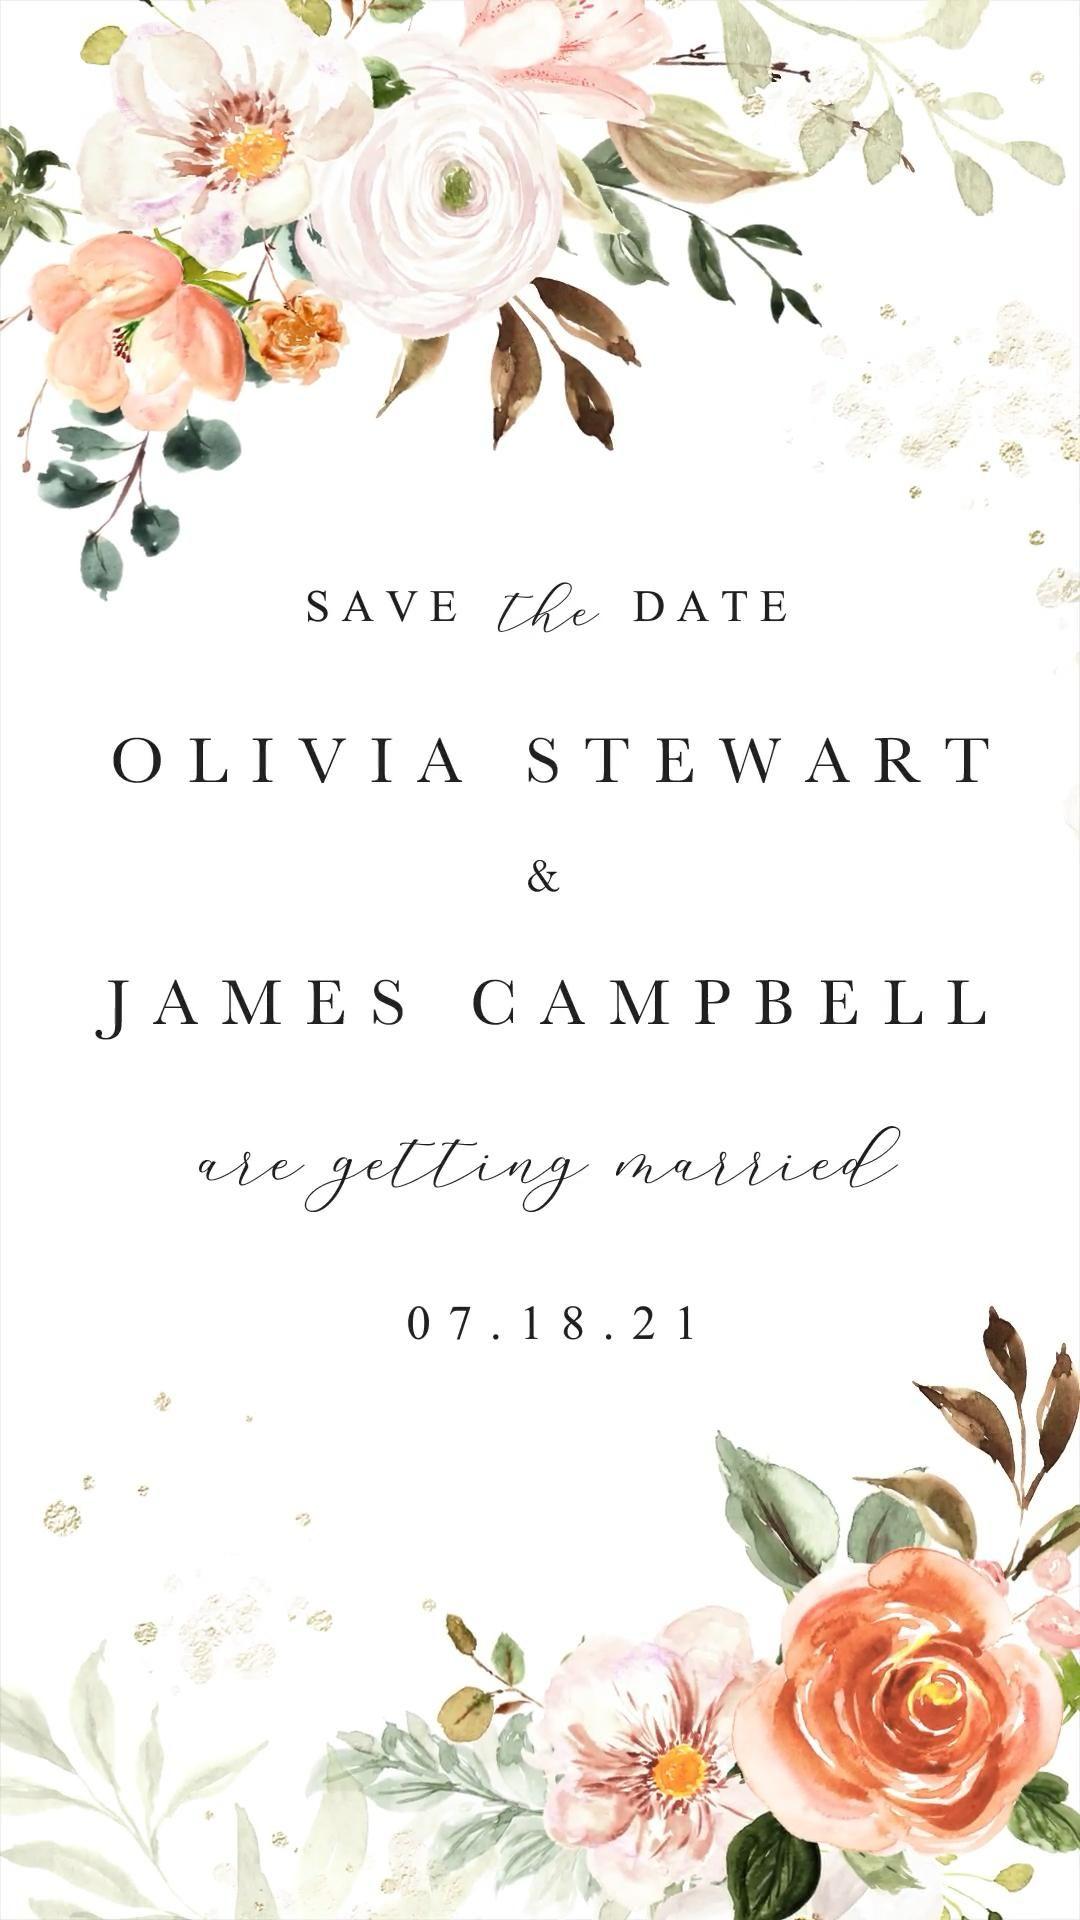 Video Rustic Boho Floral Save The Date Wedding Video Invitation Di 2020 Contoh Undangan Pernikahan Kartu Pernikahan Kartu Undangan Pernikahan